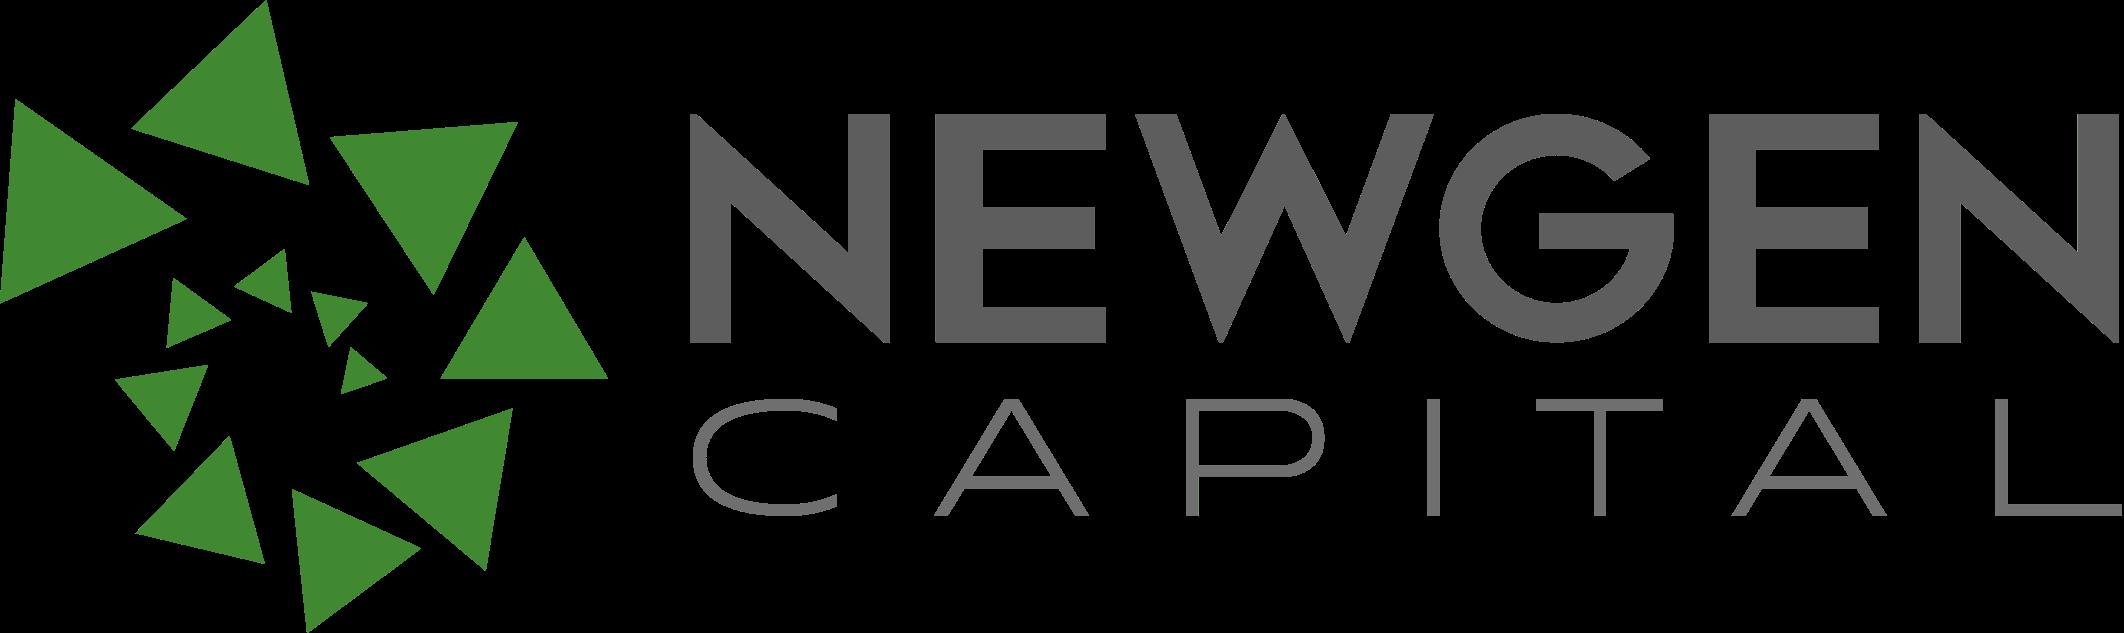 NewGen-Full-Logo_Vector-size-3.png